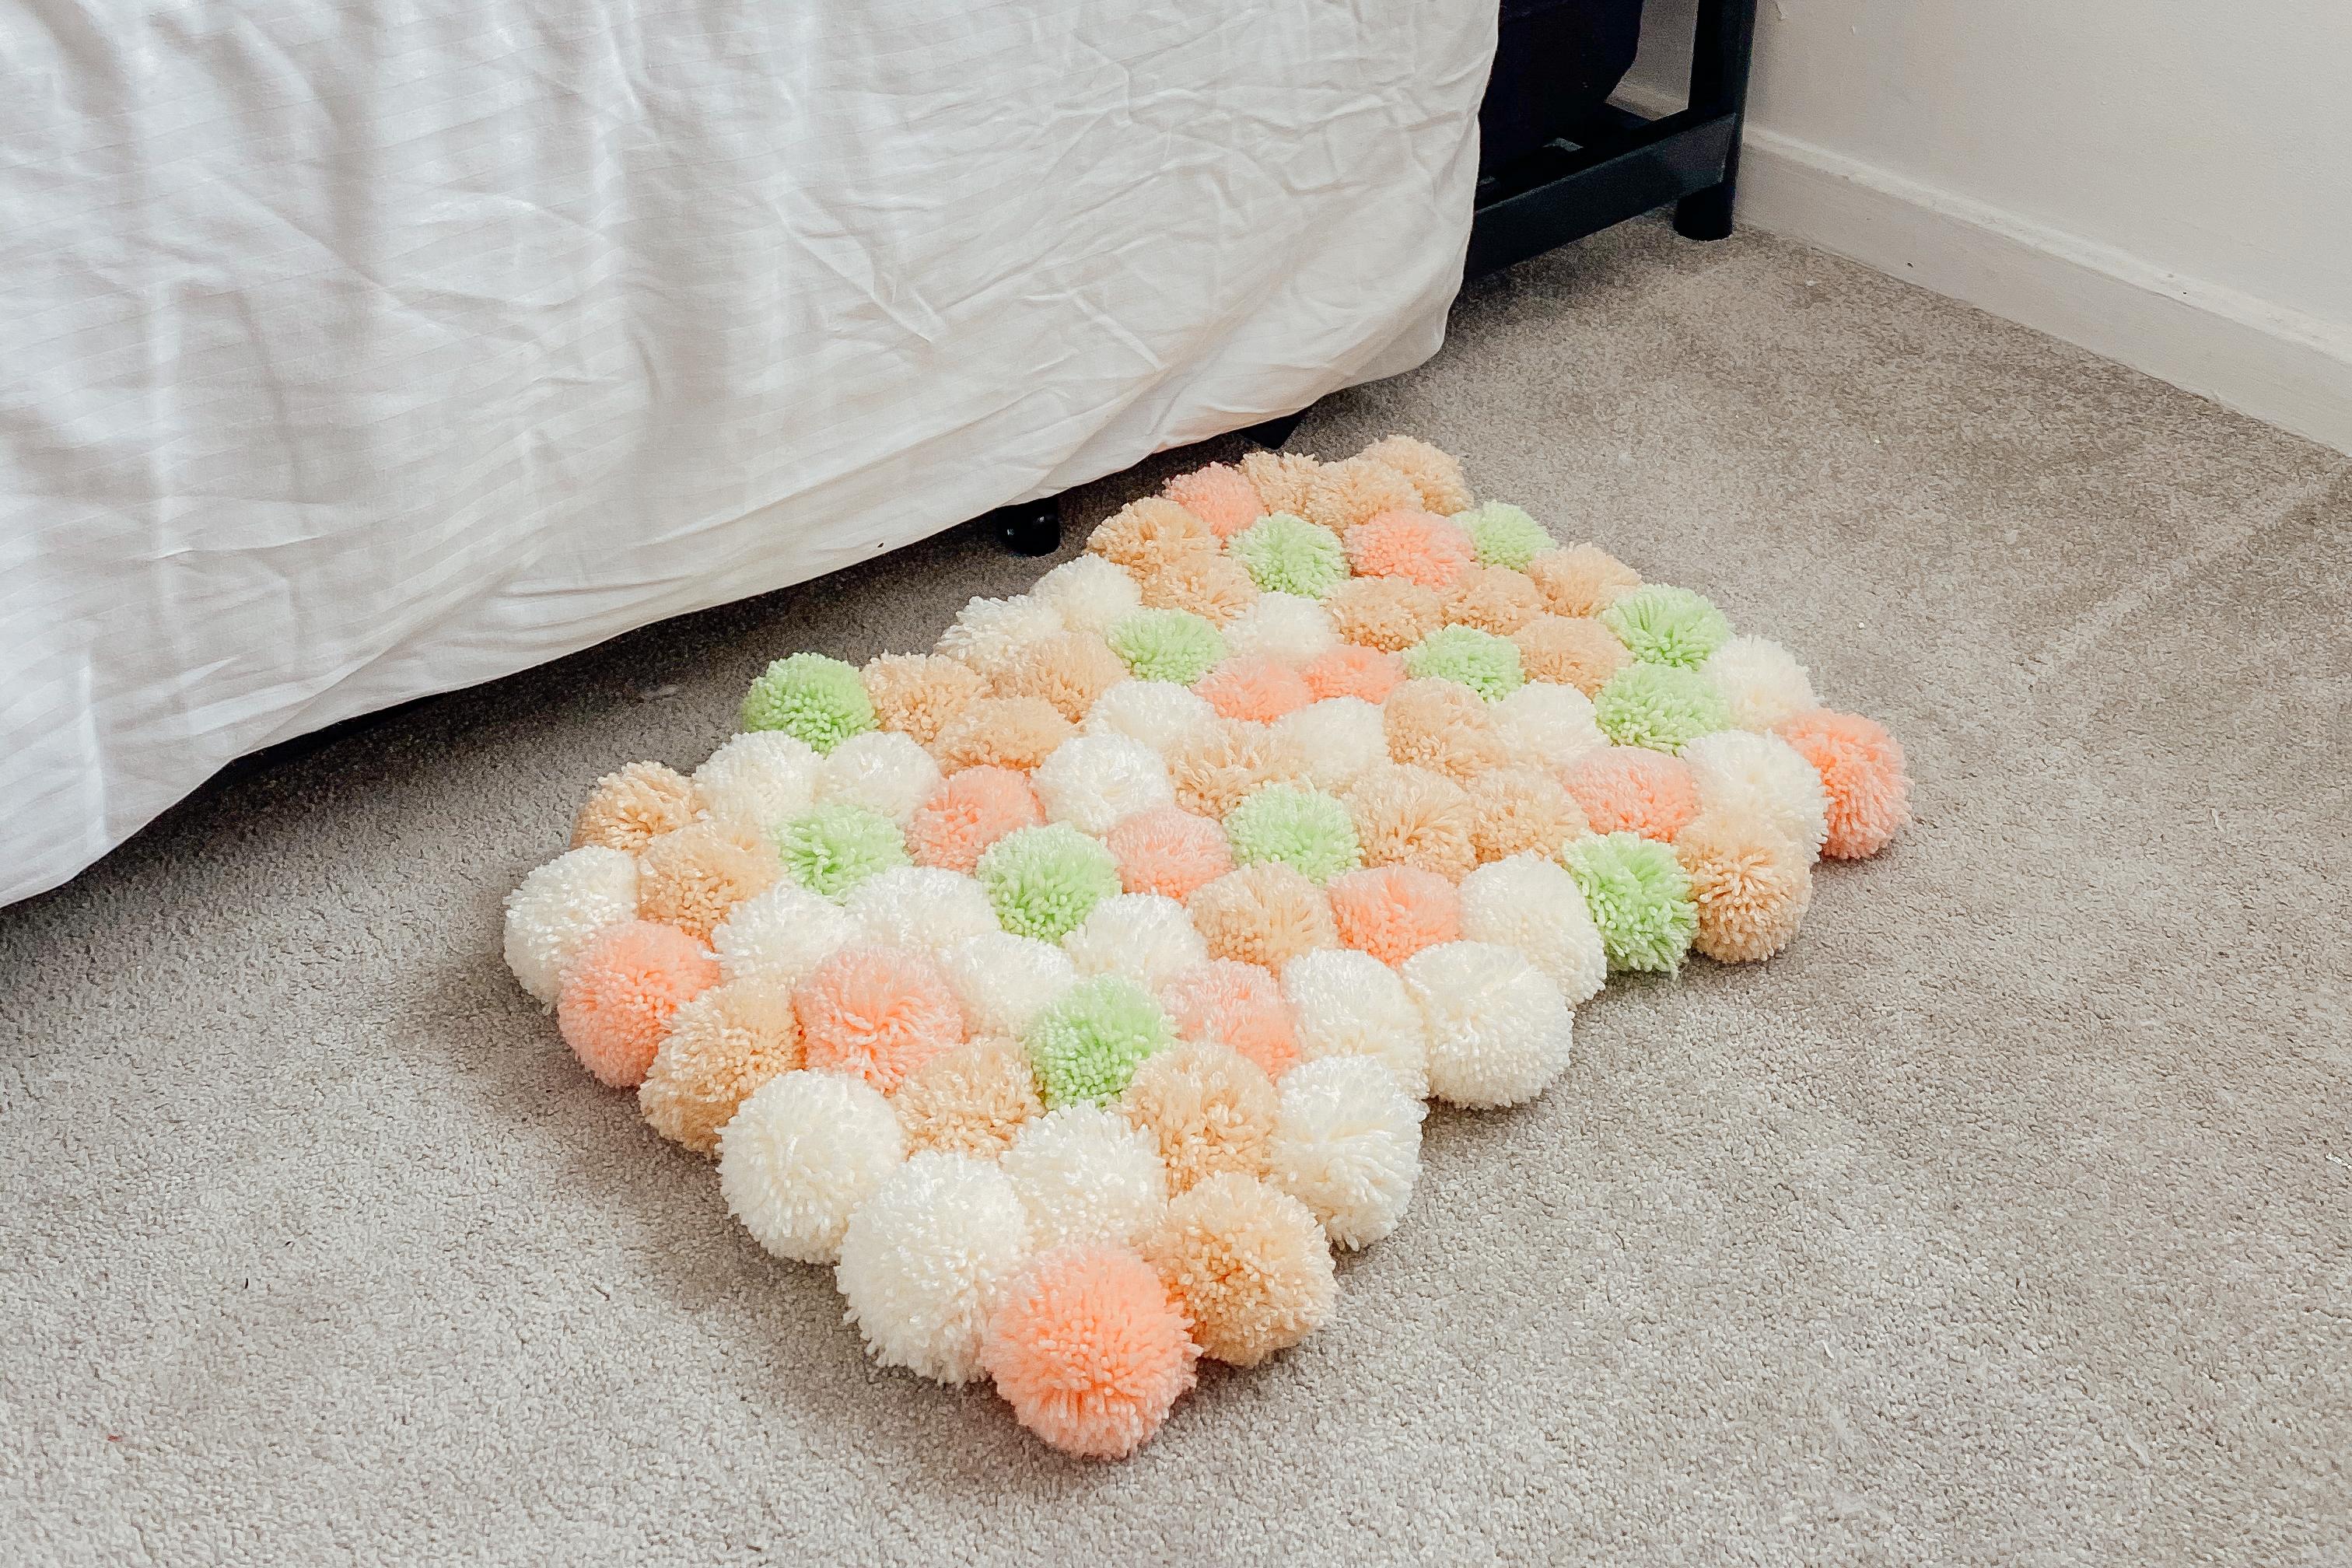 Pom-pom rug next to a bed